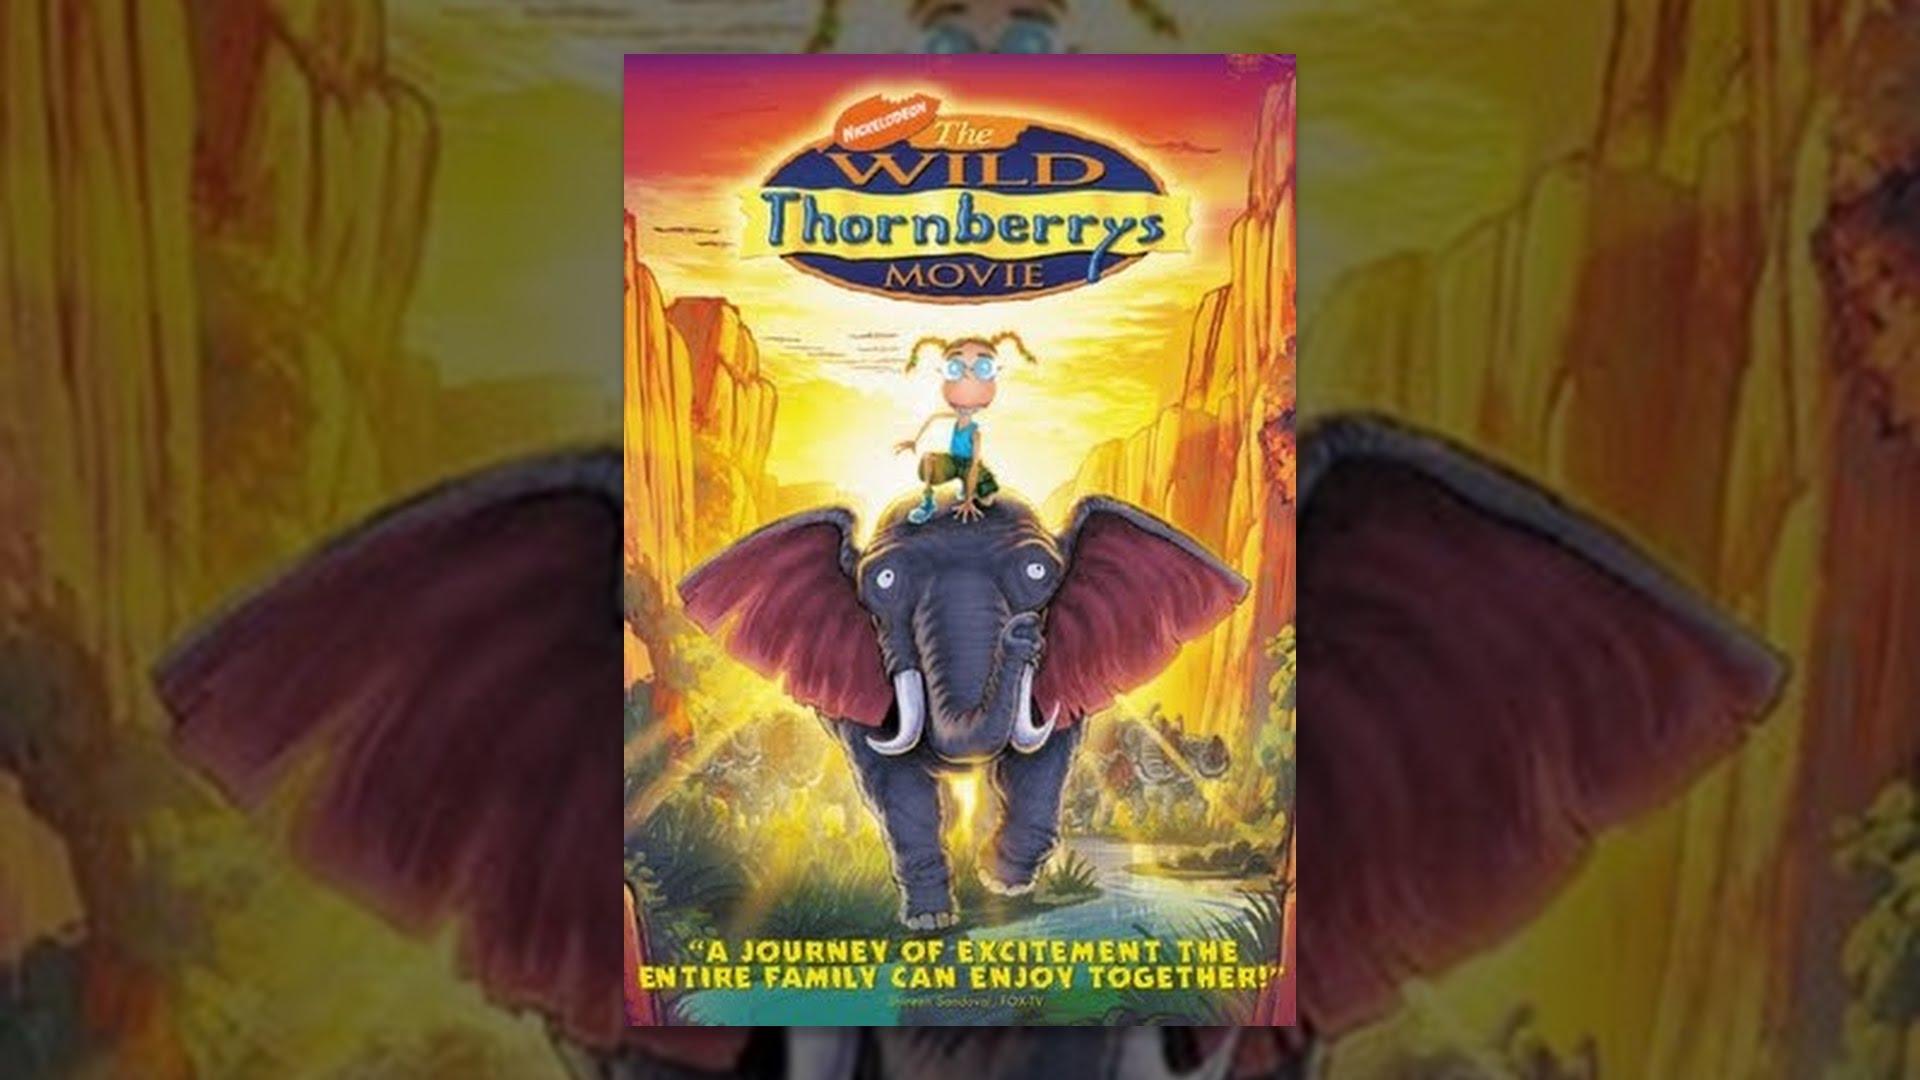 The Wild Thornberrys Movie - YouTube